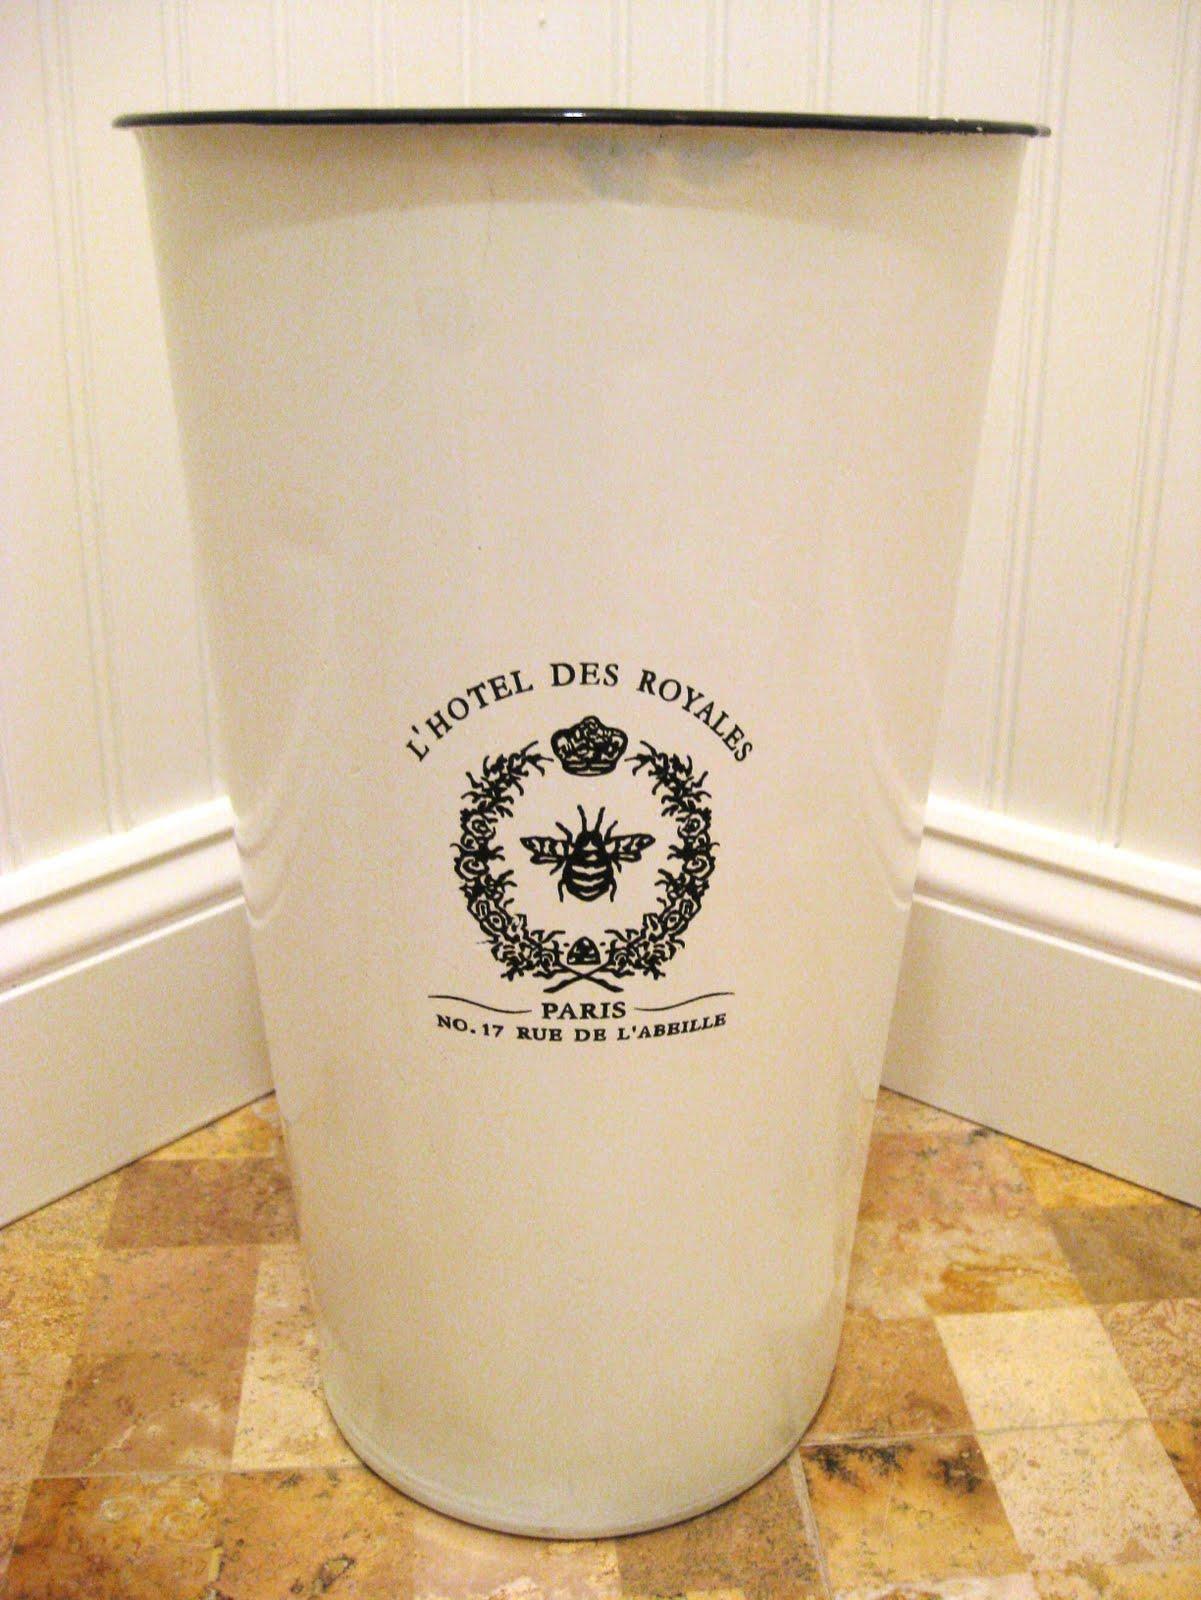 Wastebasket Options